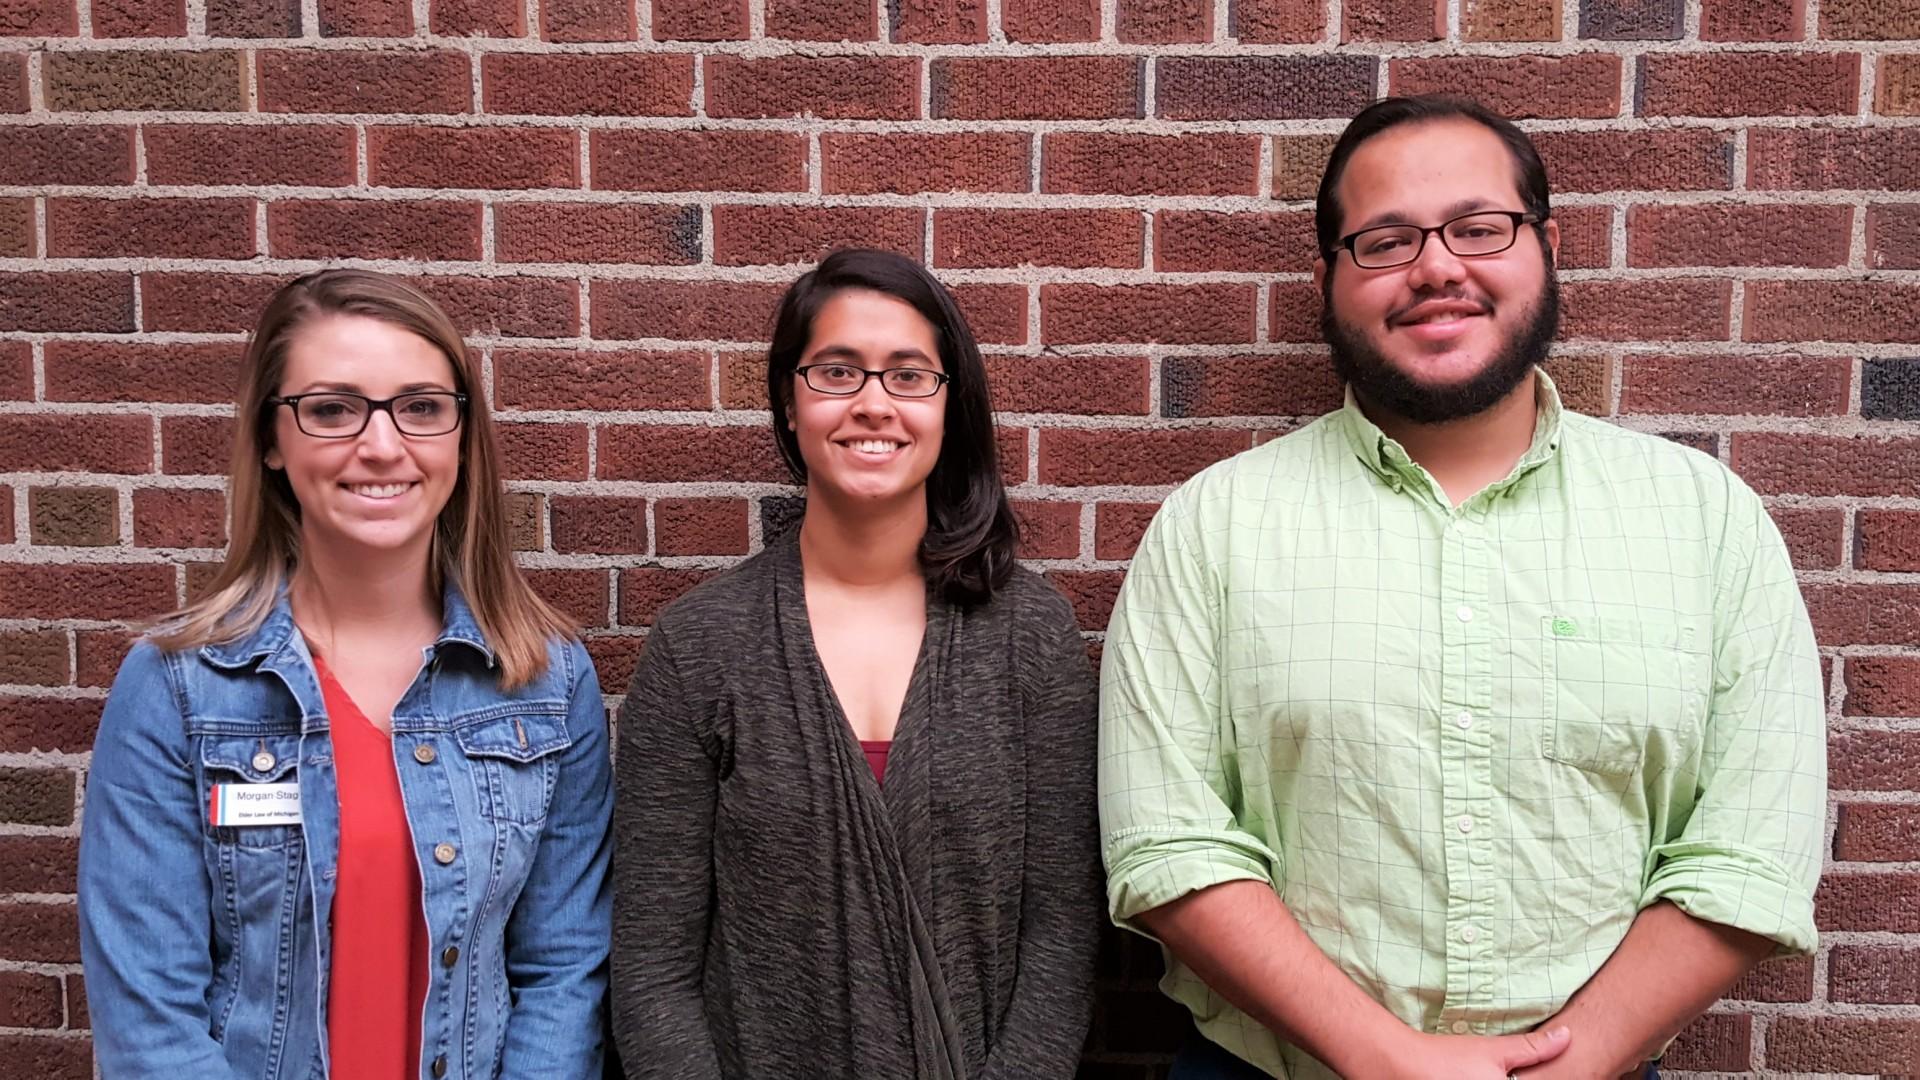 Morgan Stage, Danielle Takacs, and Heath Lowry, 2017 ELM interns.